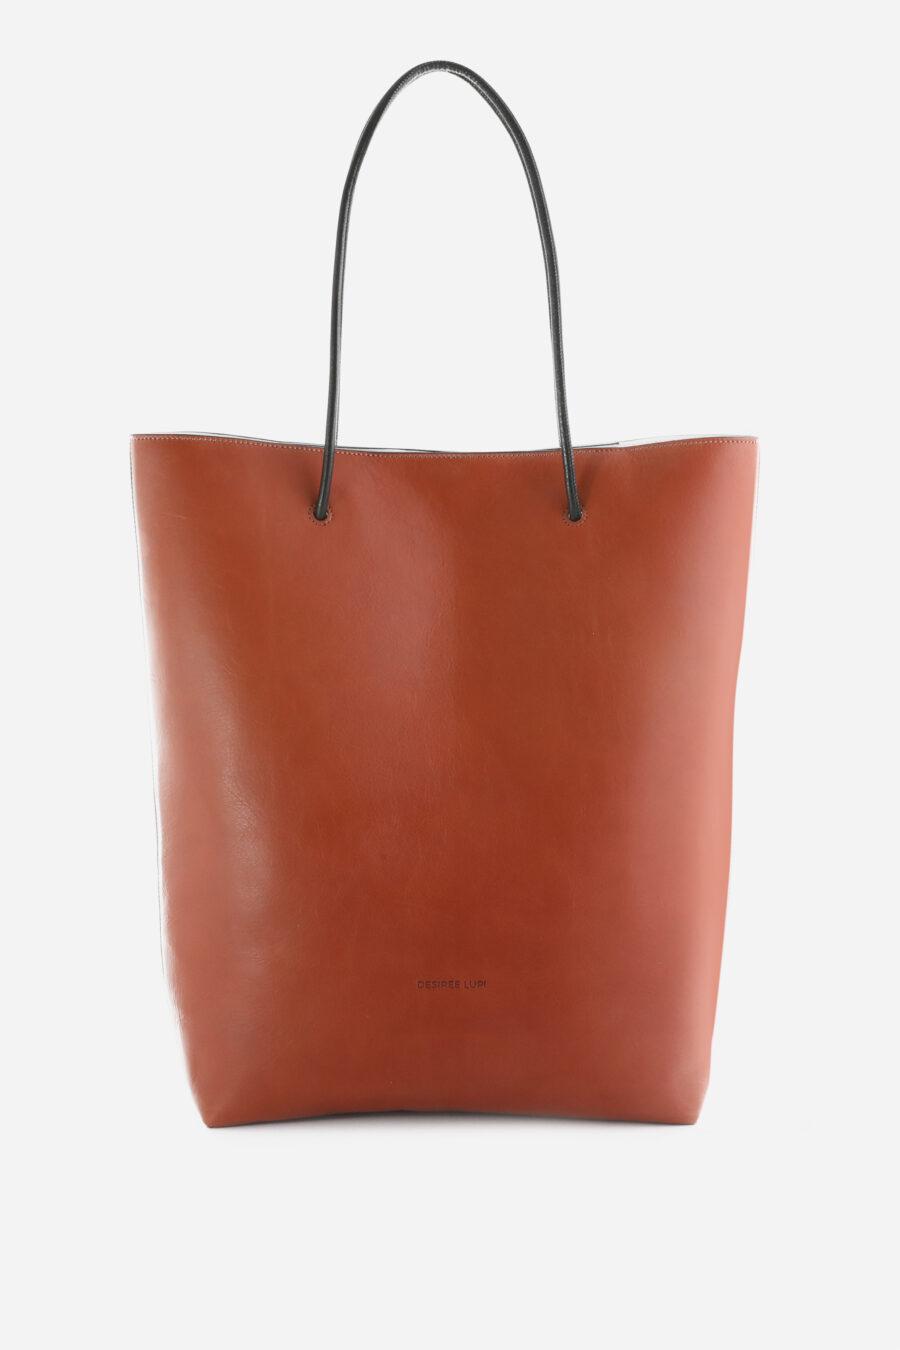 SHOPPING-BAG-KELLY-NAPPA-CUOIO_1